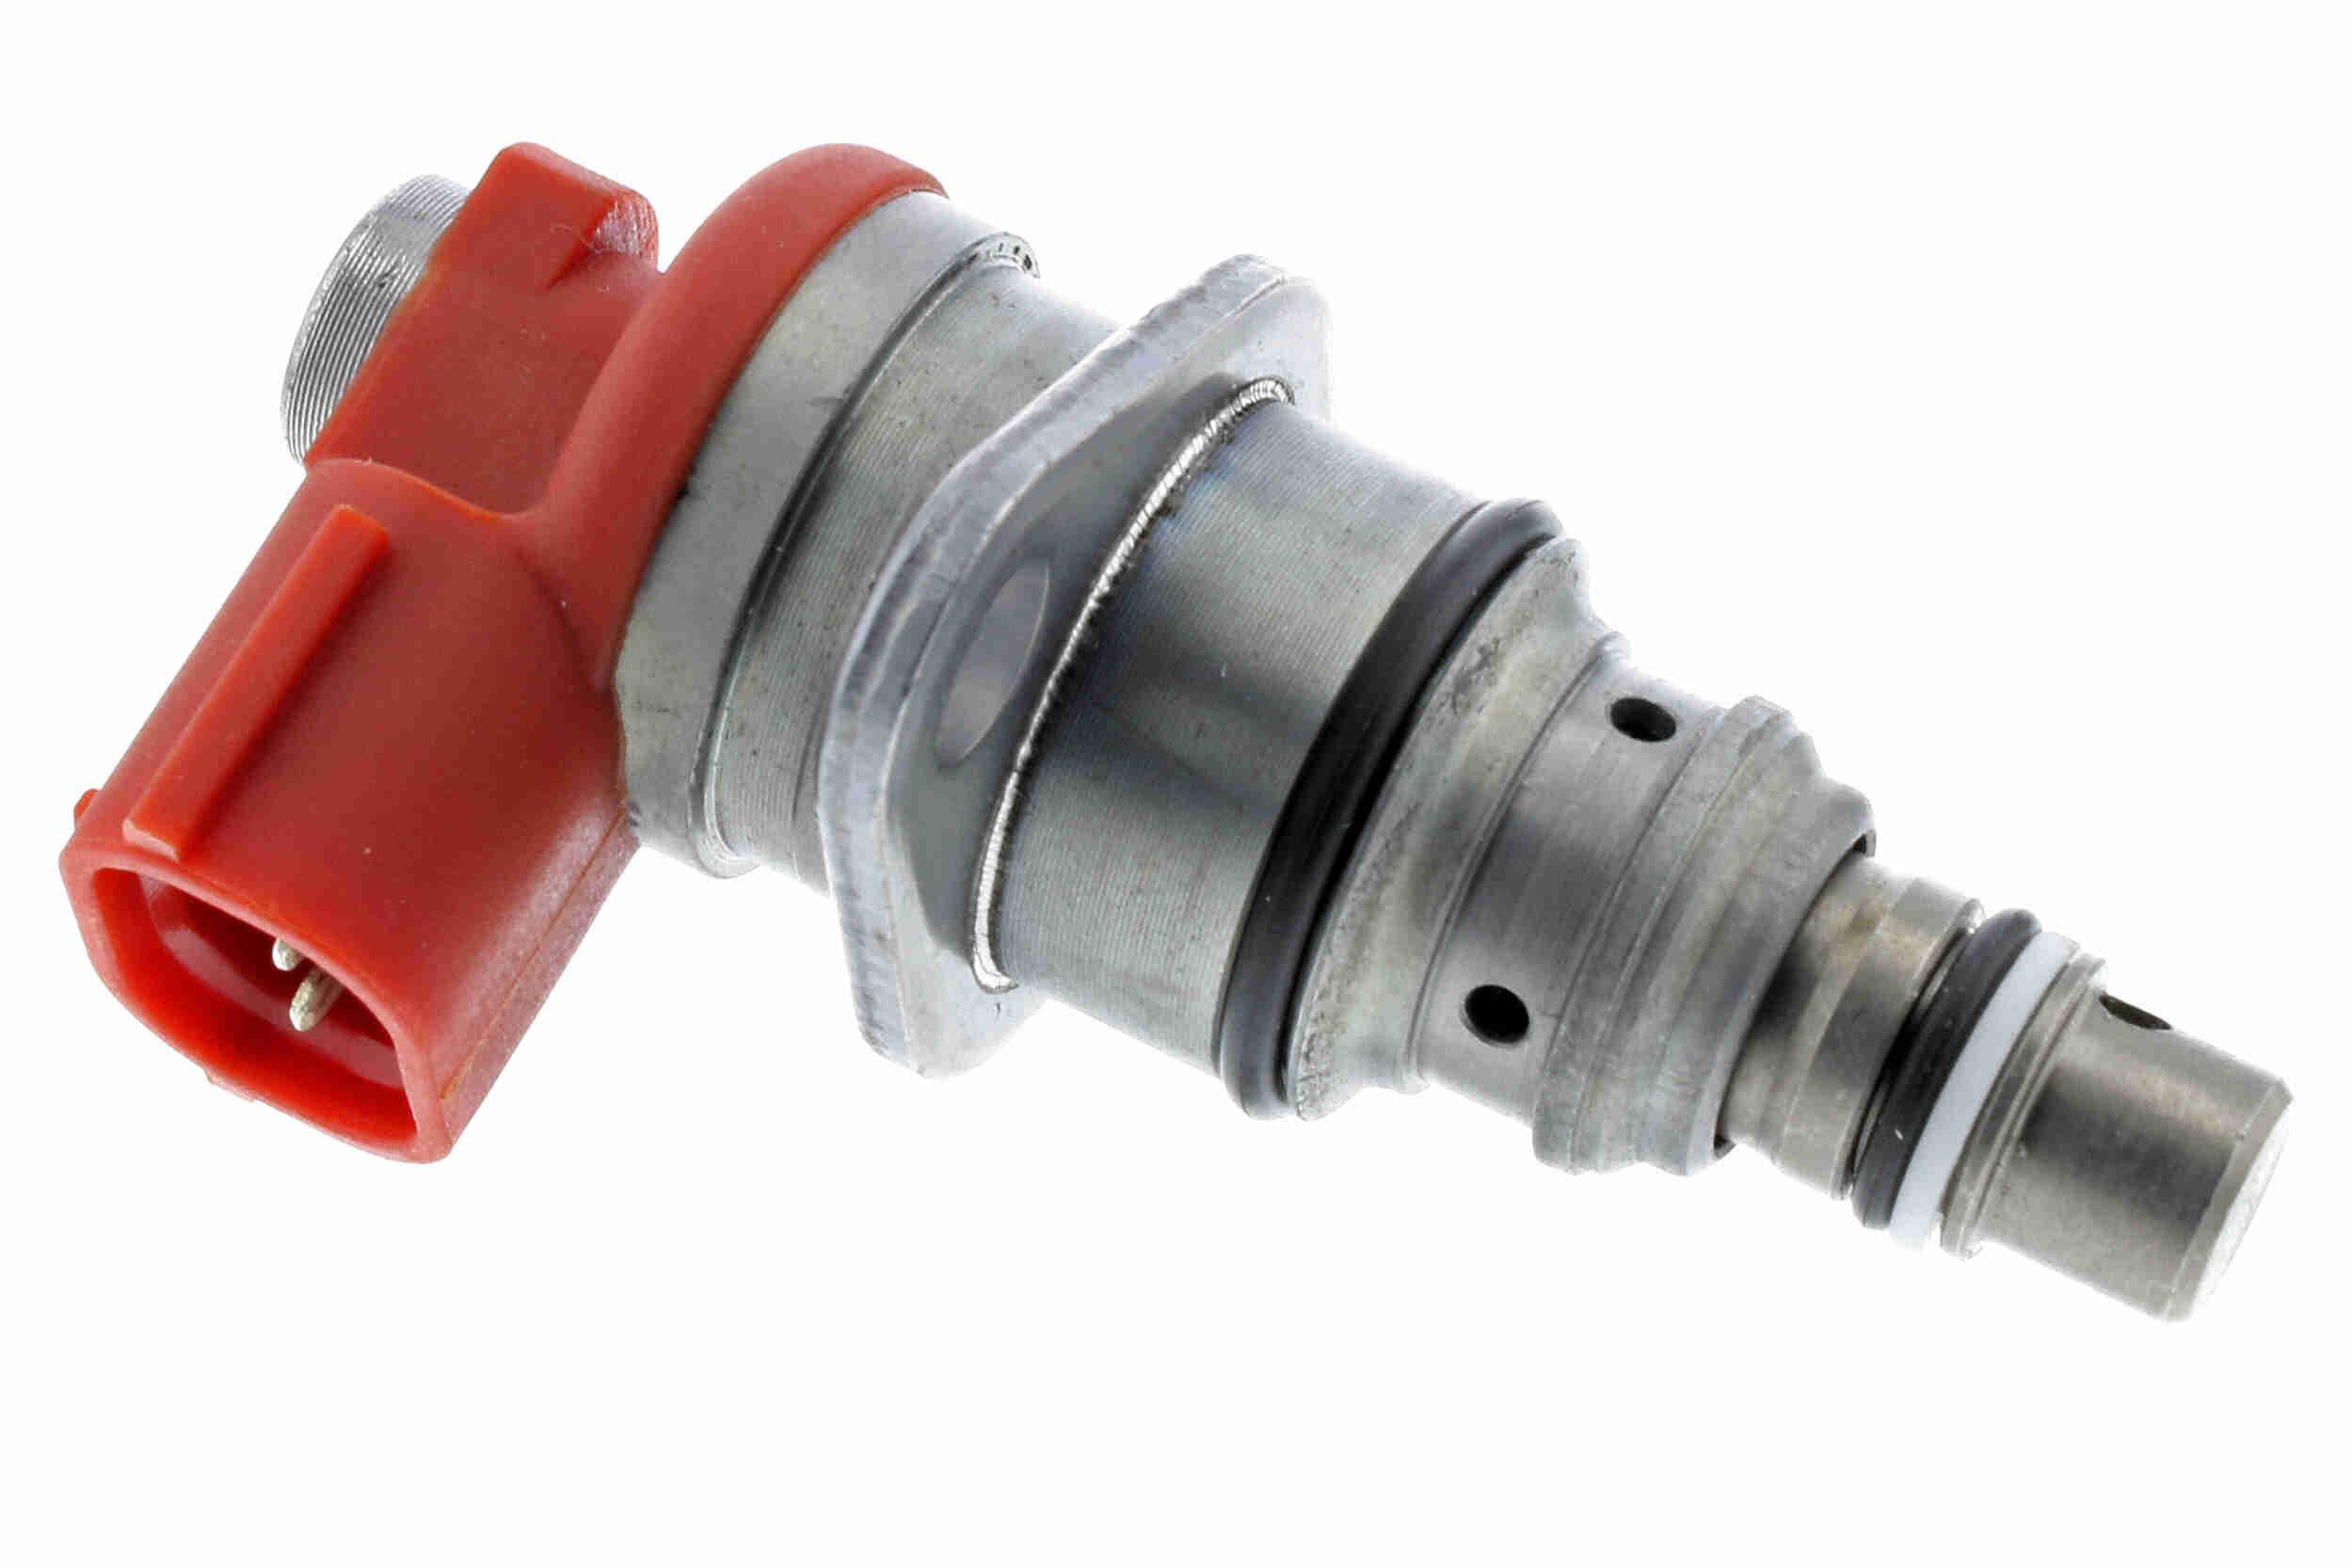 OE Original Kraftstoffdruckregler A70-11-0004 ACKOJA